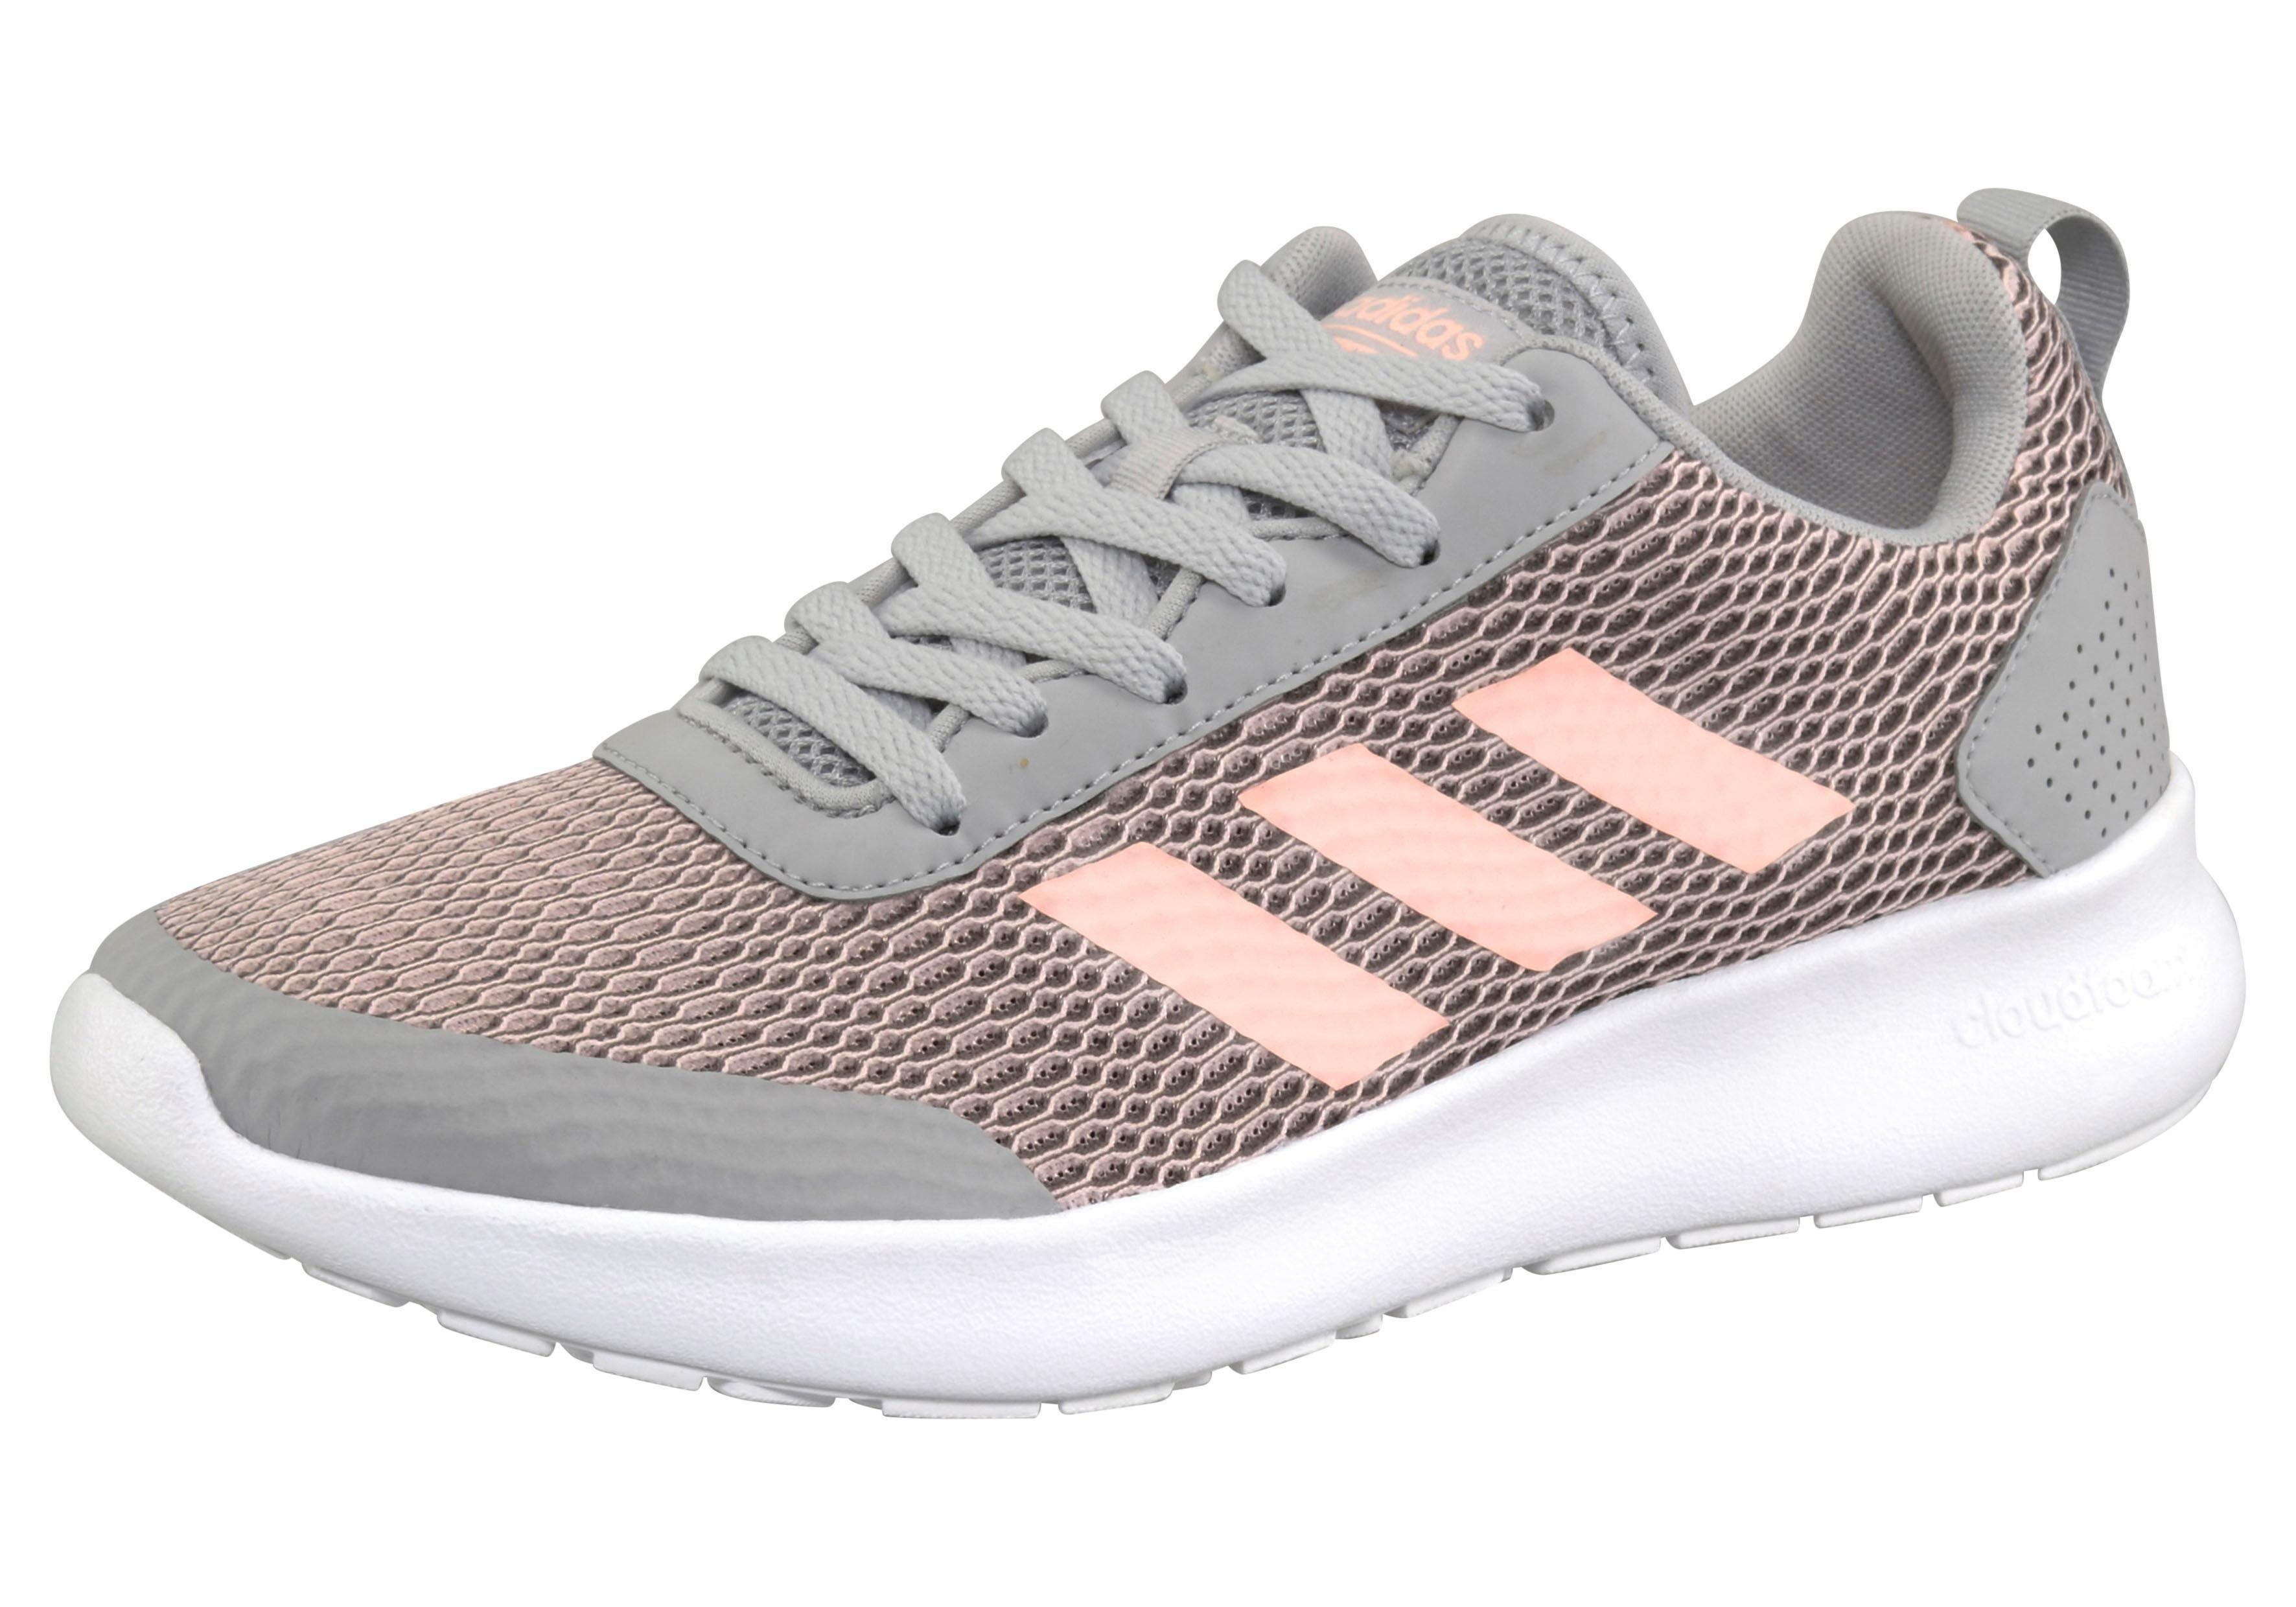 adidas Cloudfoam Element Race W Laufschuh kaufen  grau-rosa